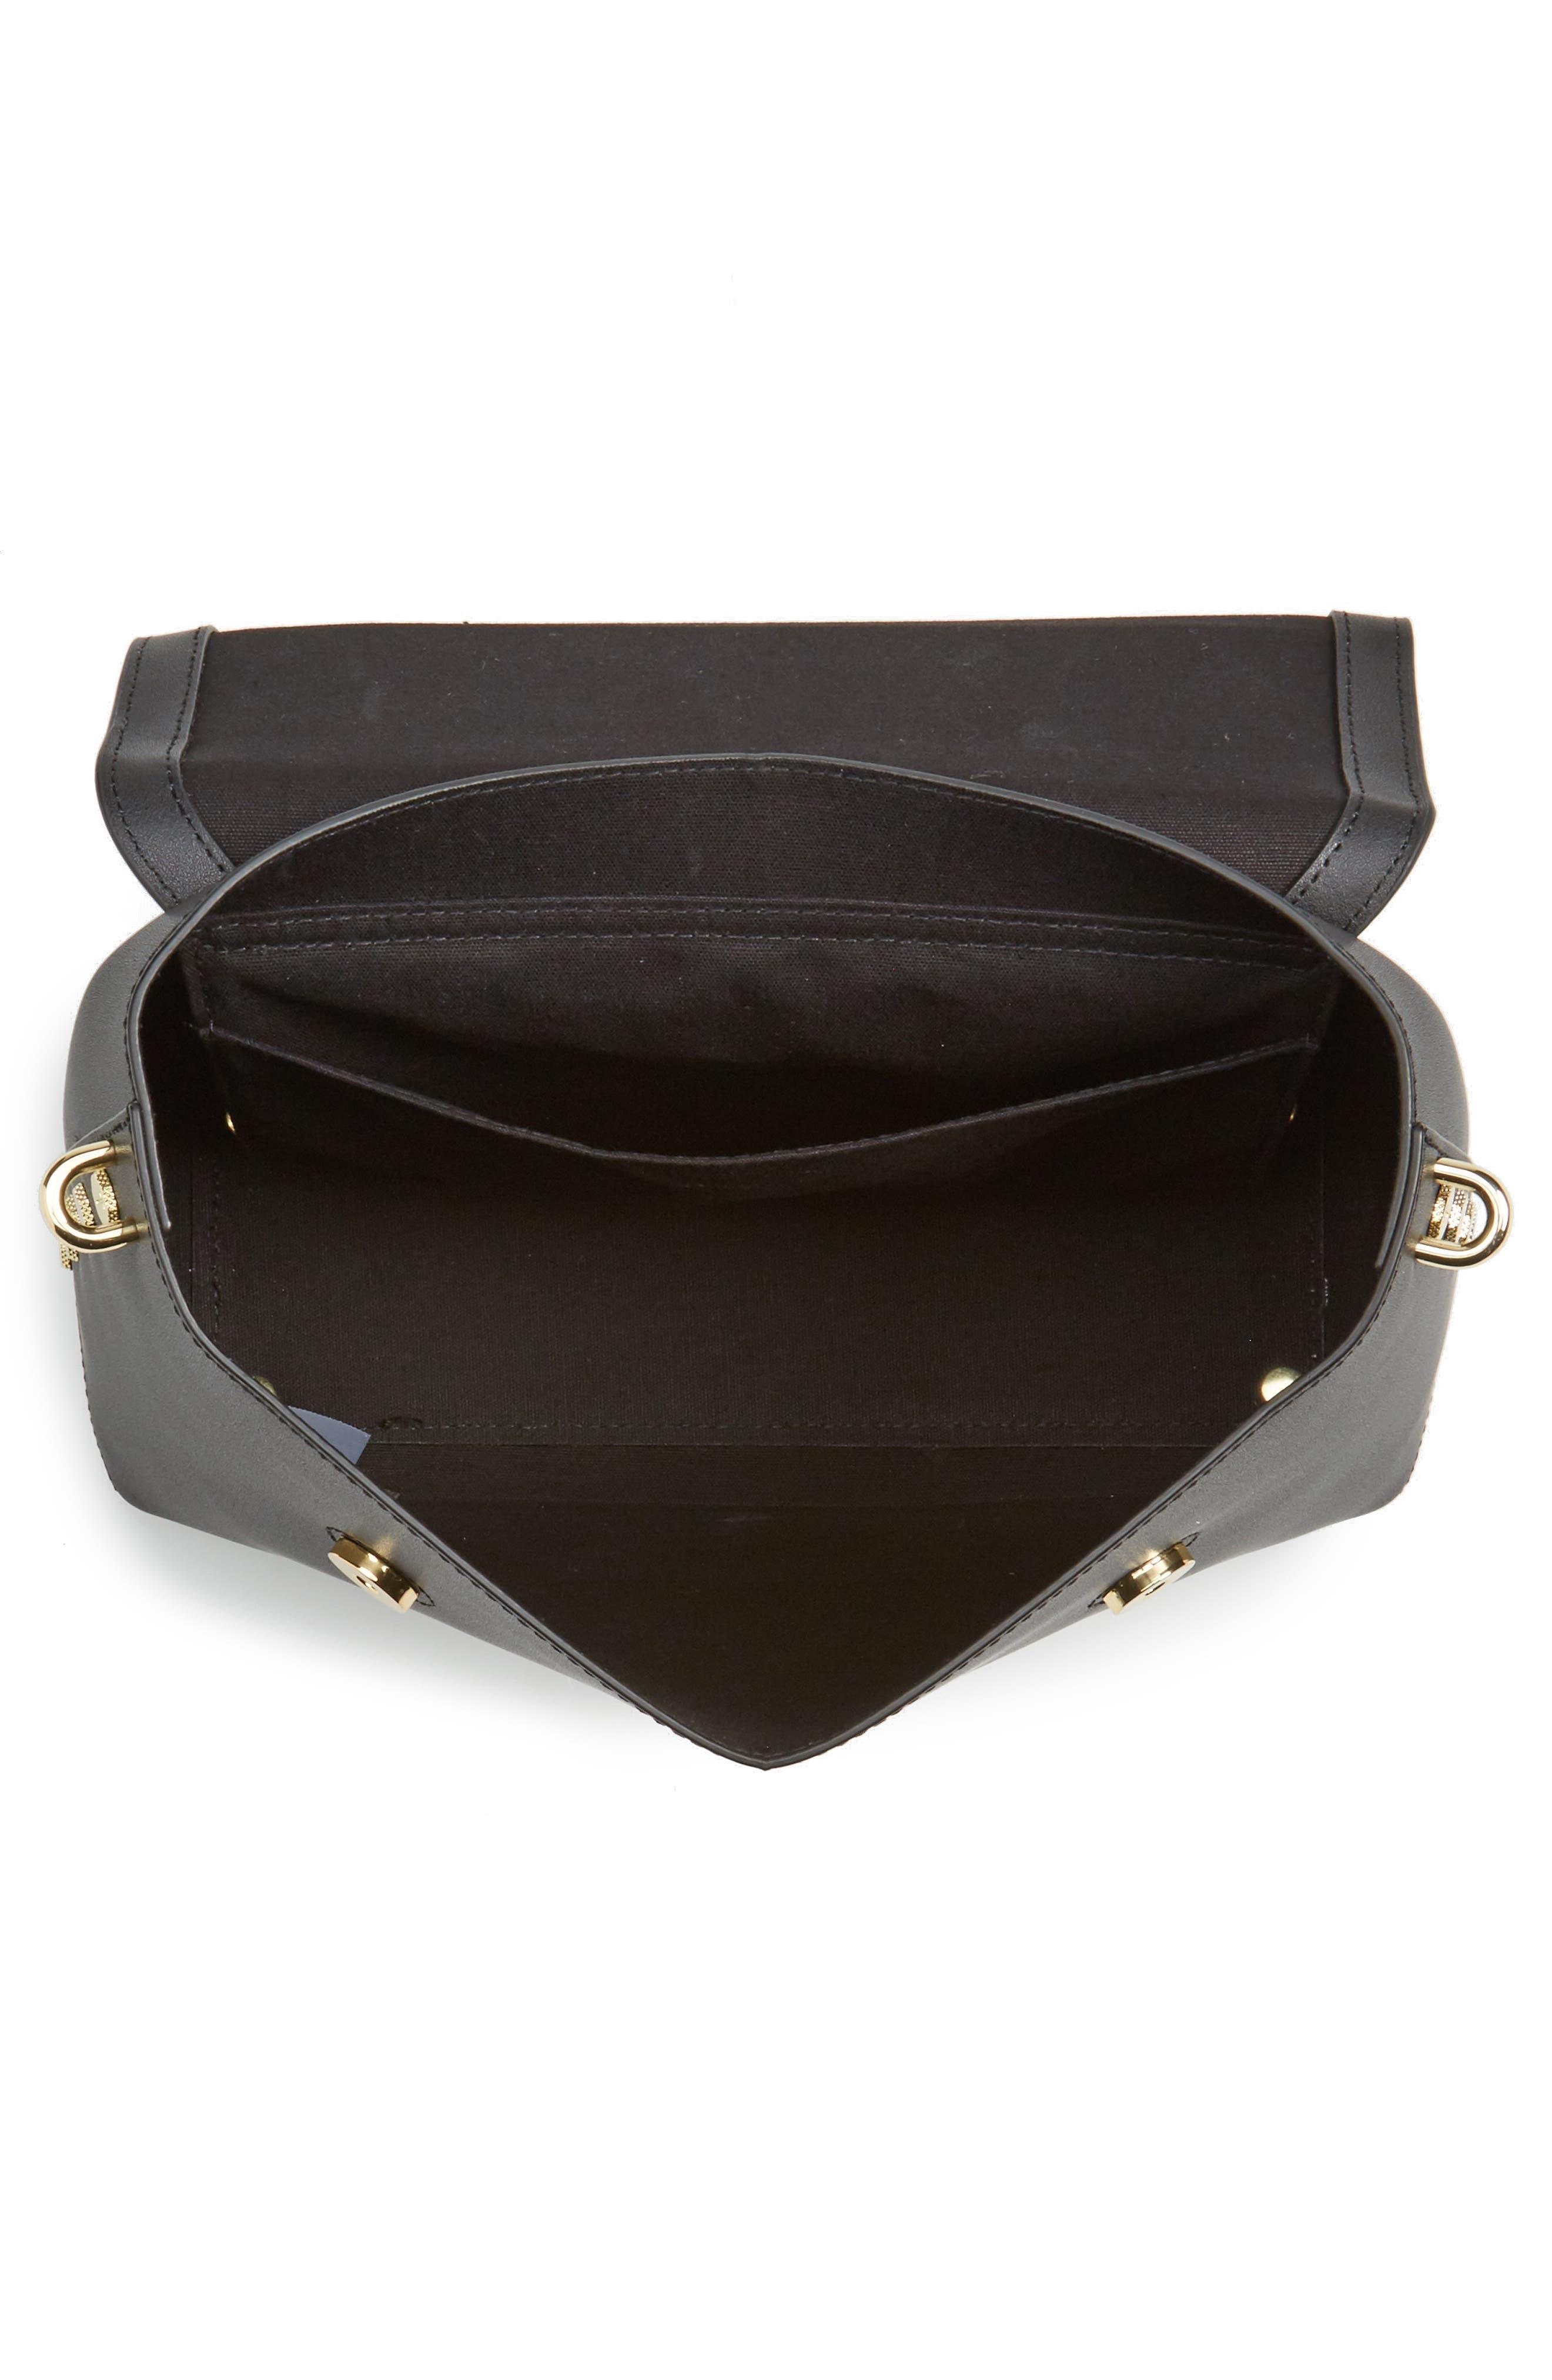 Taymar - Studded Edge Lady Bag Leather Top Handle Satchel,                             Alternate thumbnail 3, color,                             Black